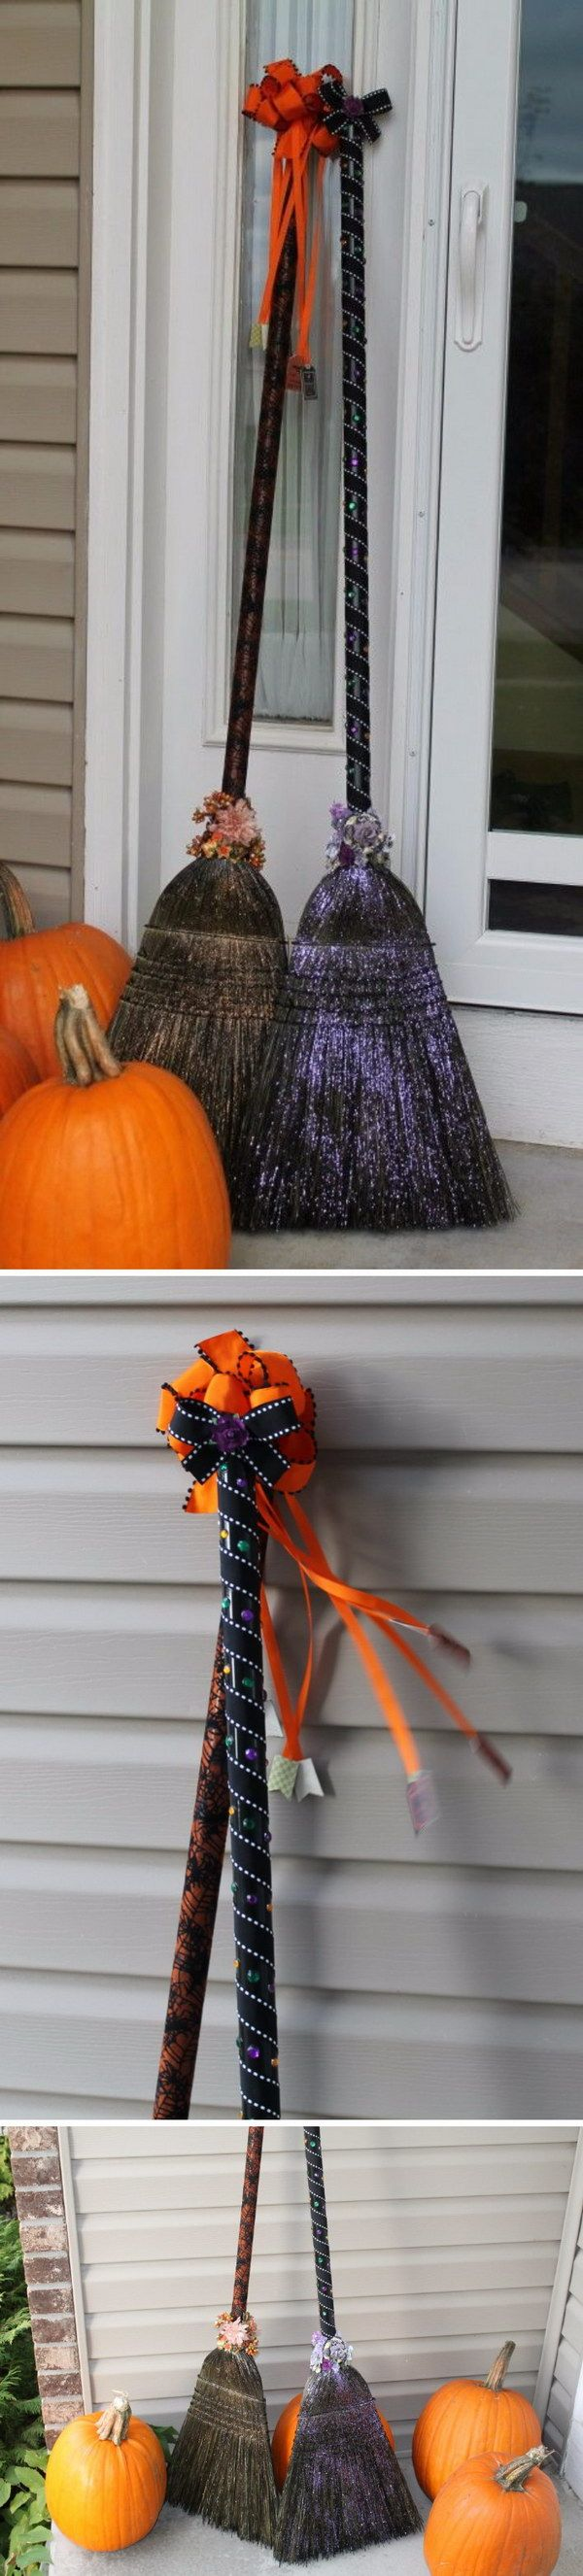 halloween store year round